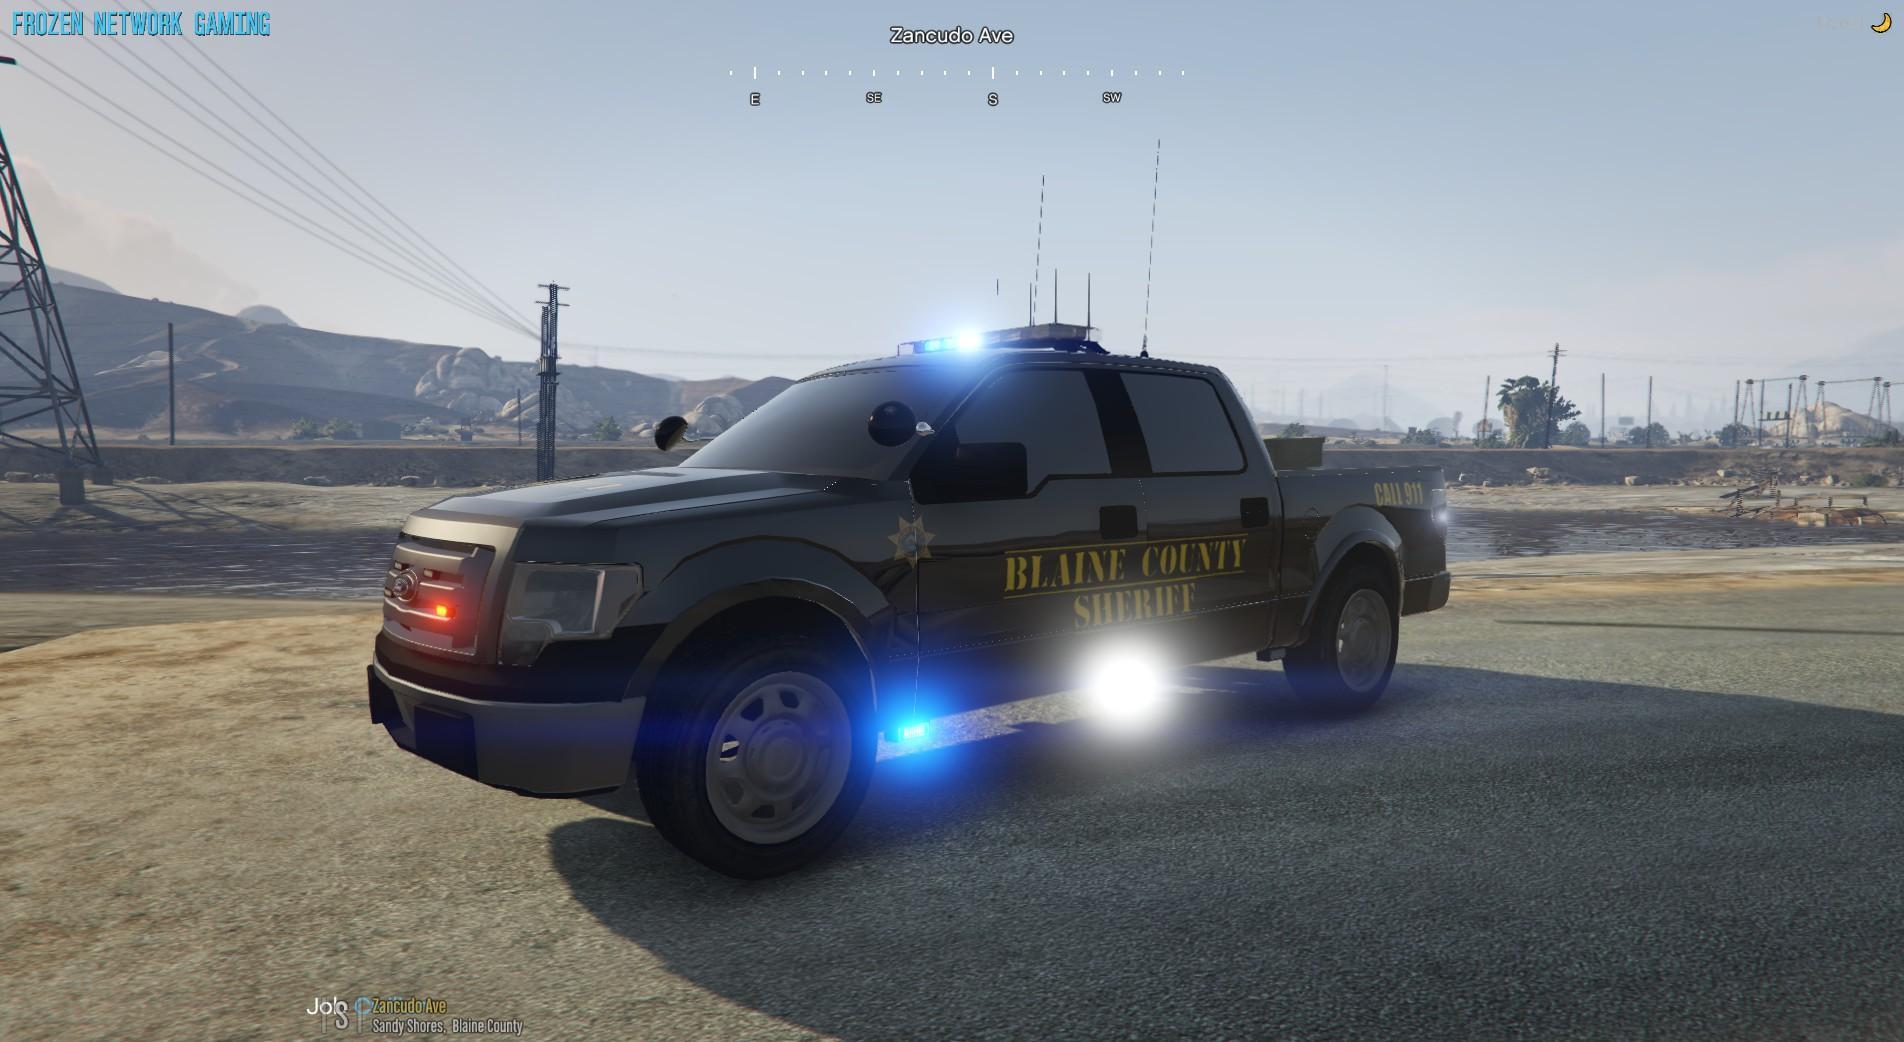 Ford F150 Blaine County Sheriff Utility - GTA5-Mods.com